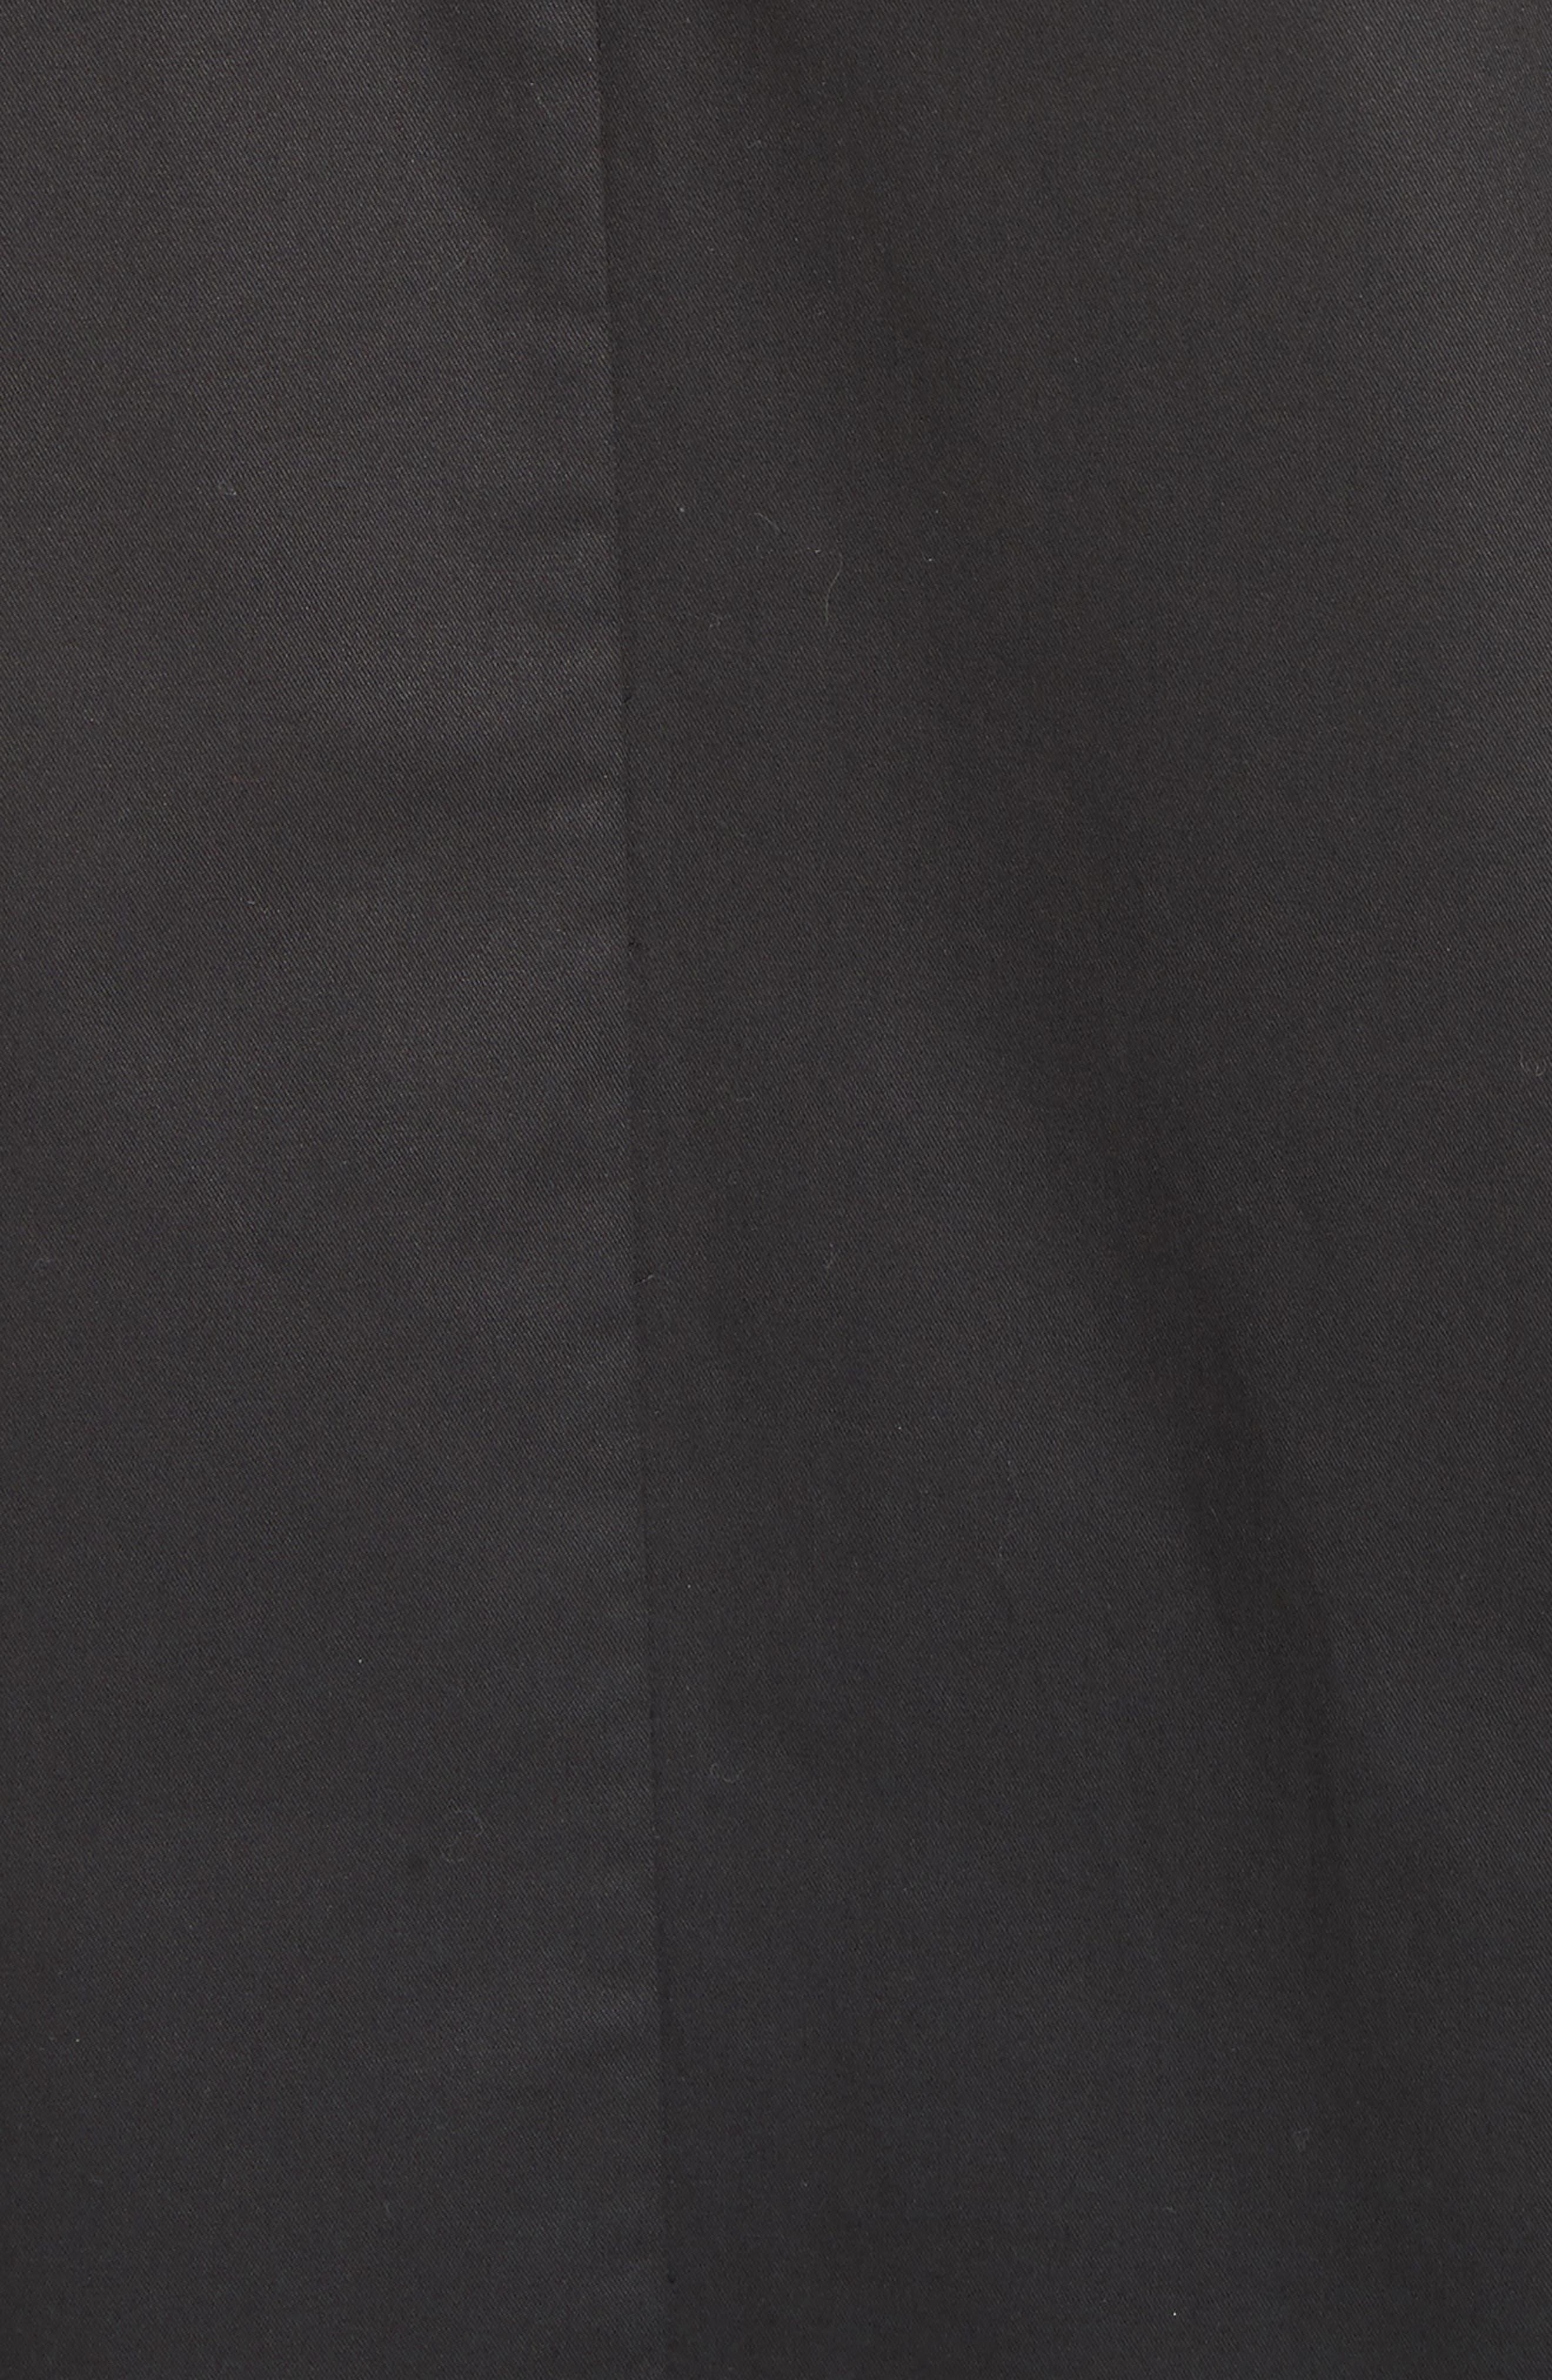 embroidered cutwork minidress,                             Alternate thumbnail 5, color,                             Black